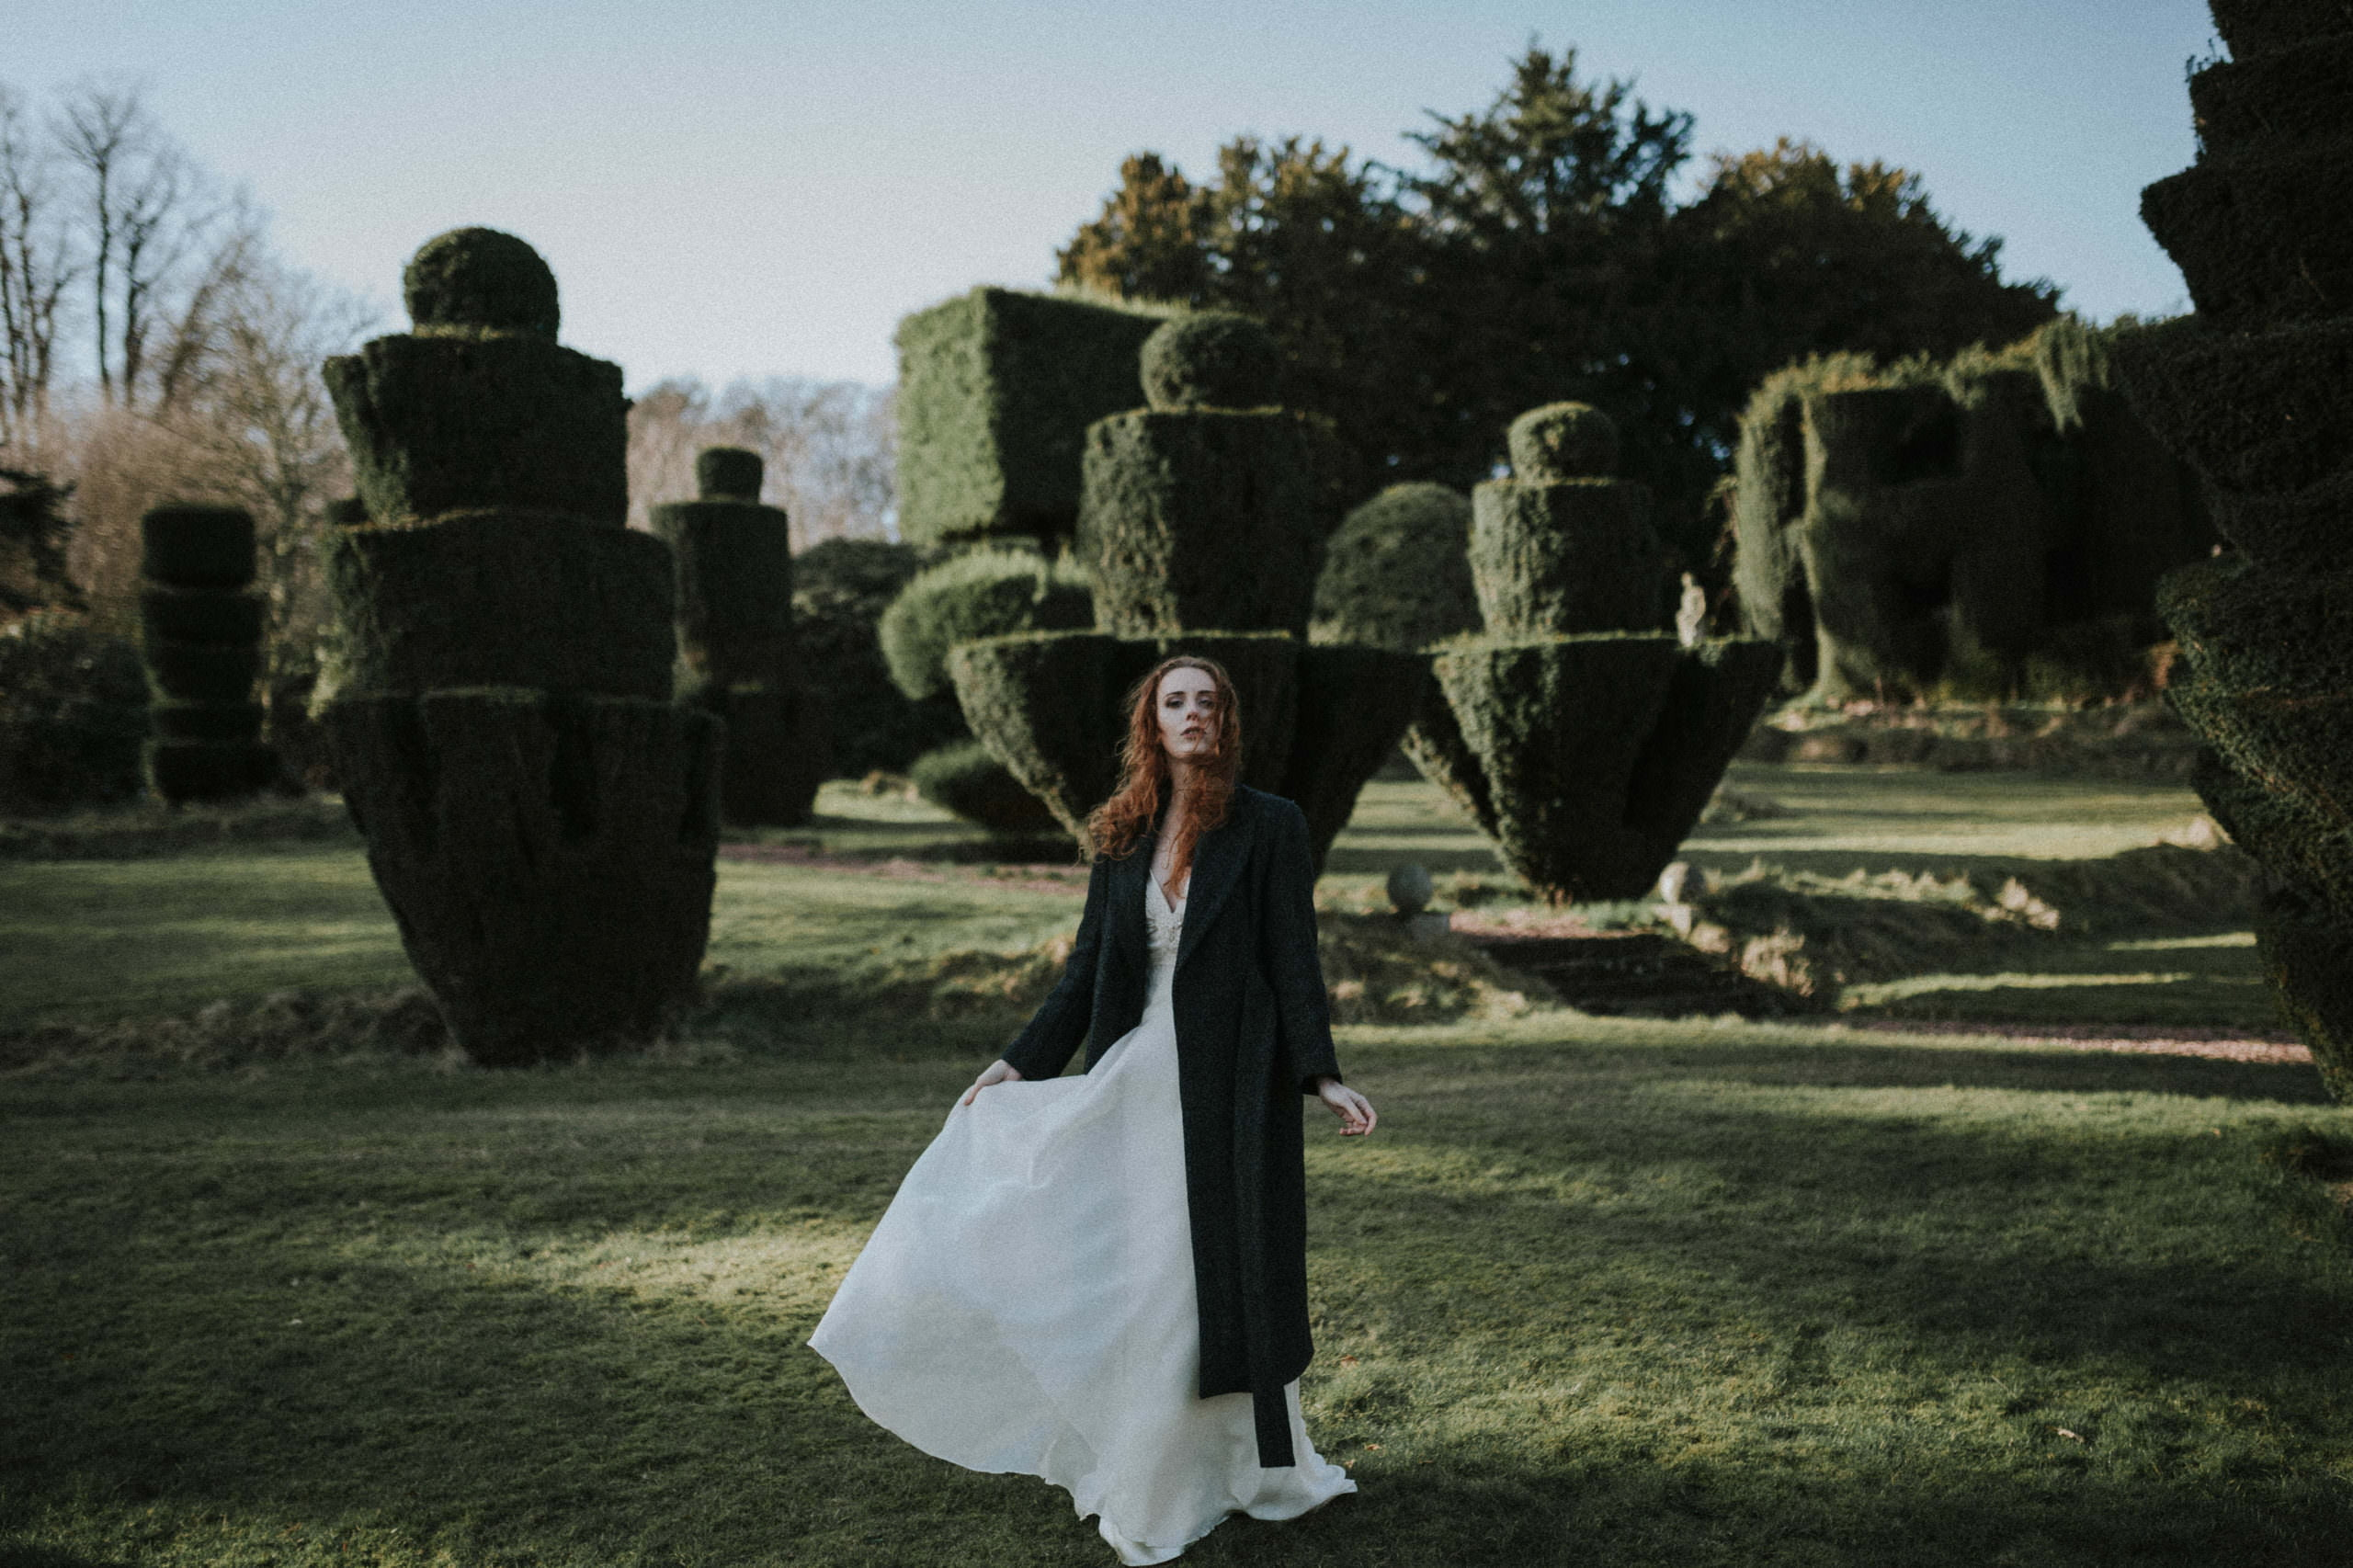 Wedding in Fingask Castle - Perthshire Castle Wedding Venue, Perthshire Wedding Photographer